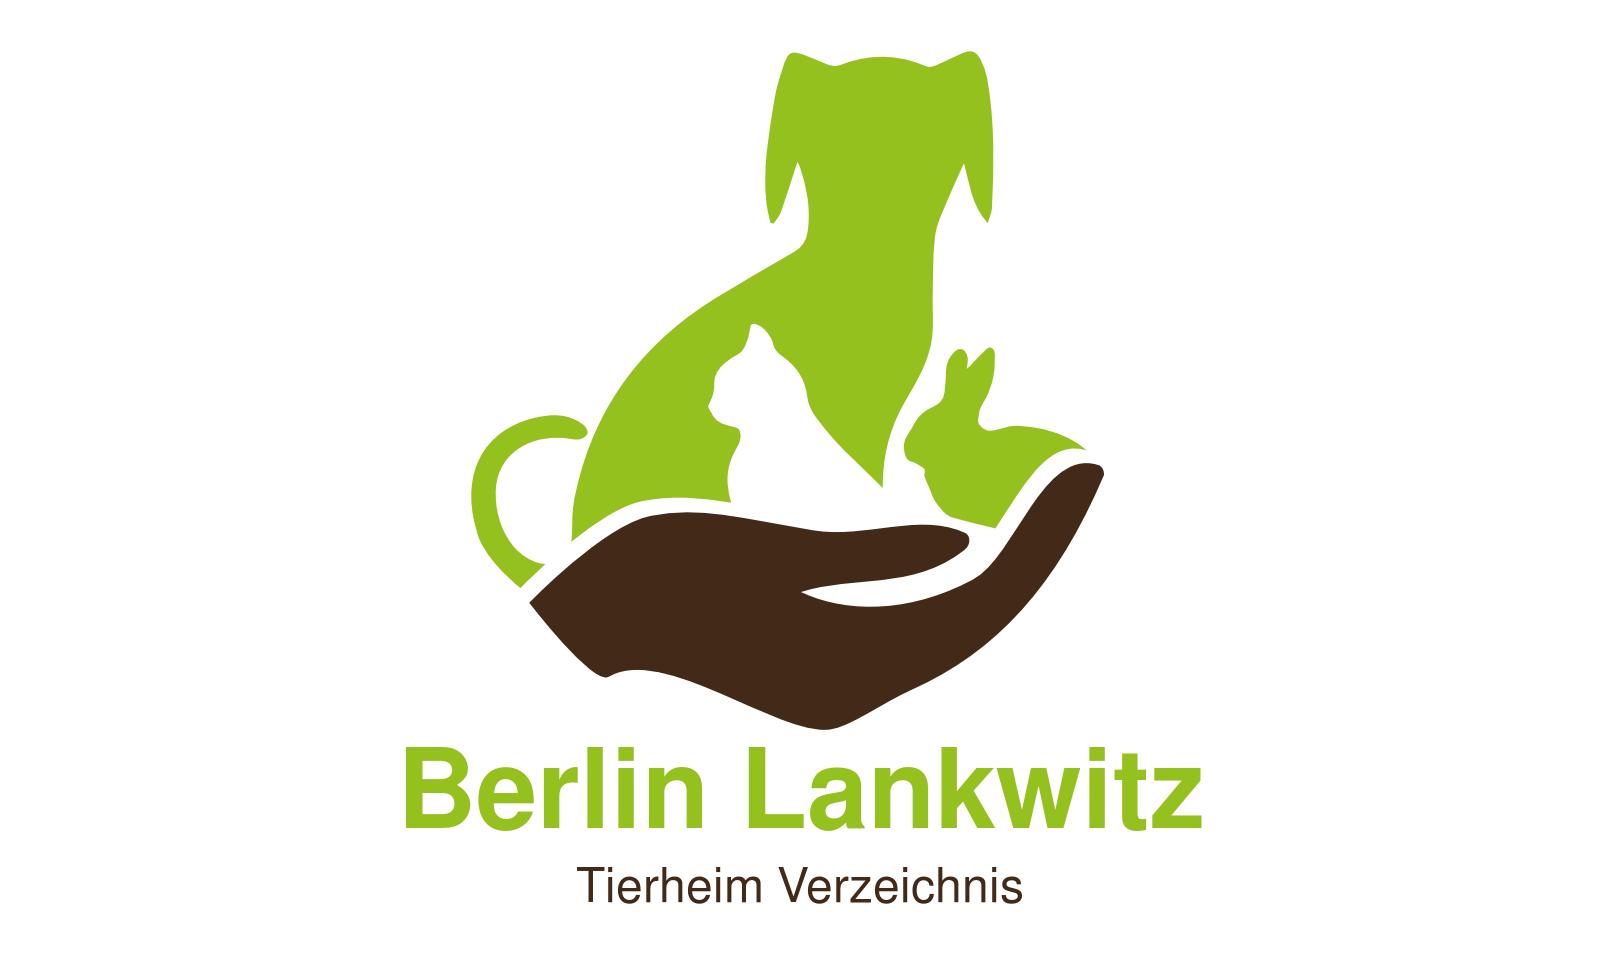 Tierheim Berlin Lankwitz